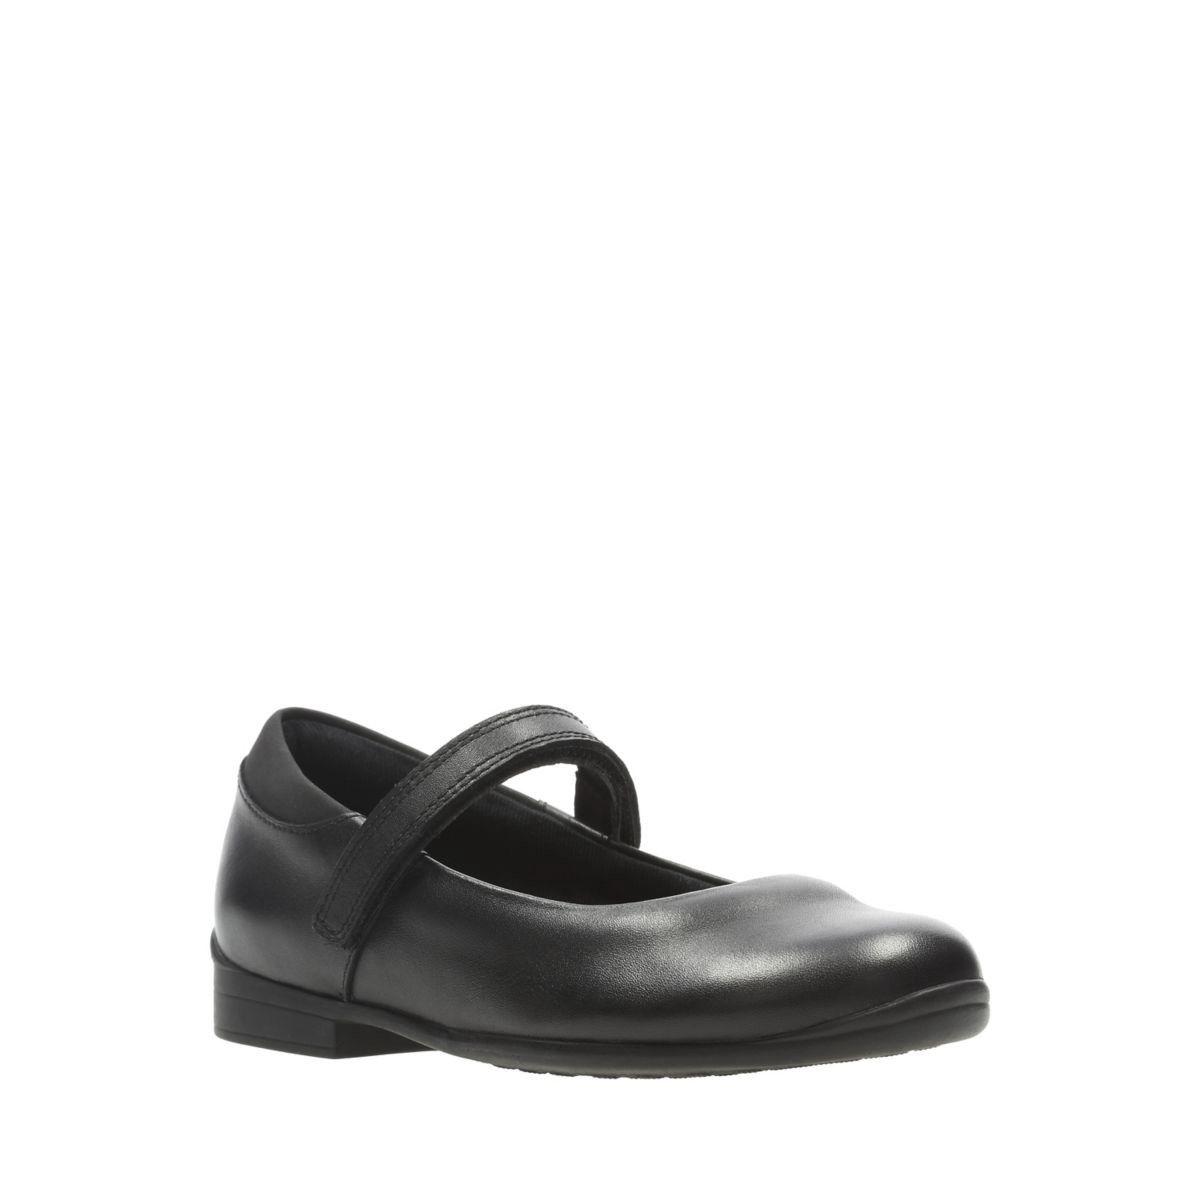 Clarks Girls /'Jamie Star/' Black Leather School Shoes